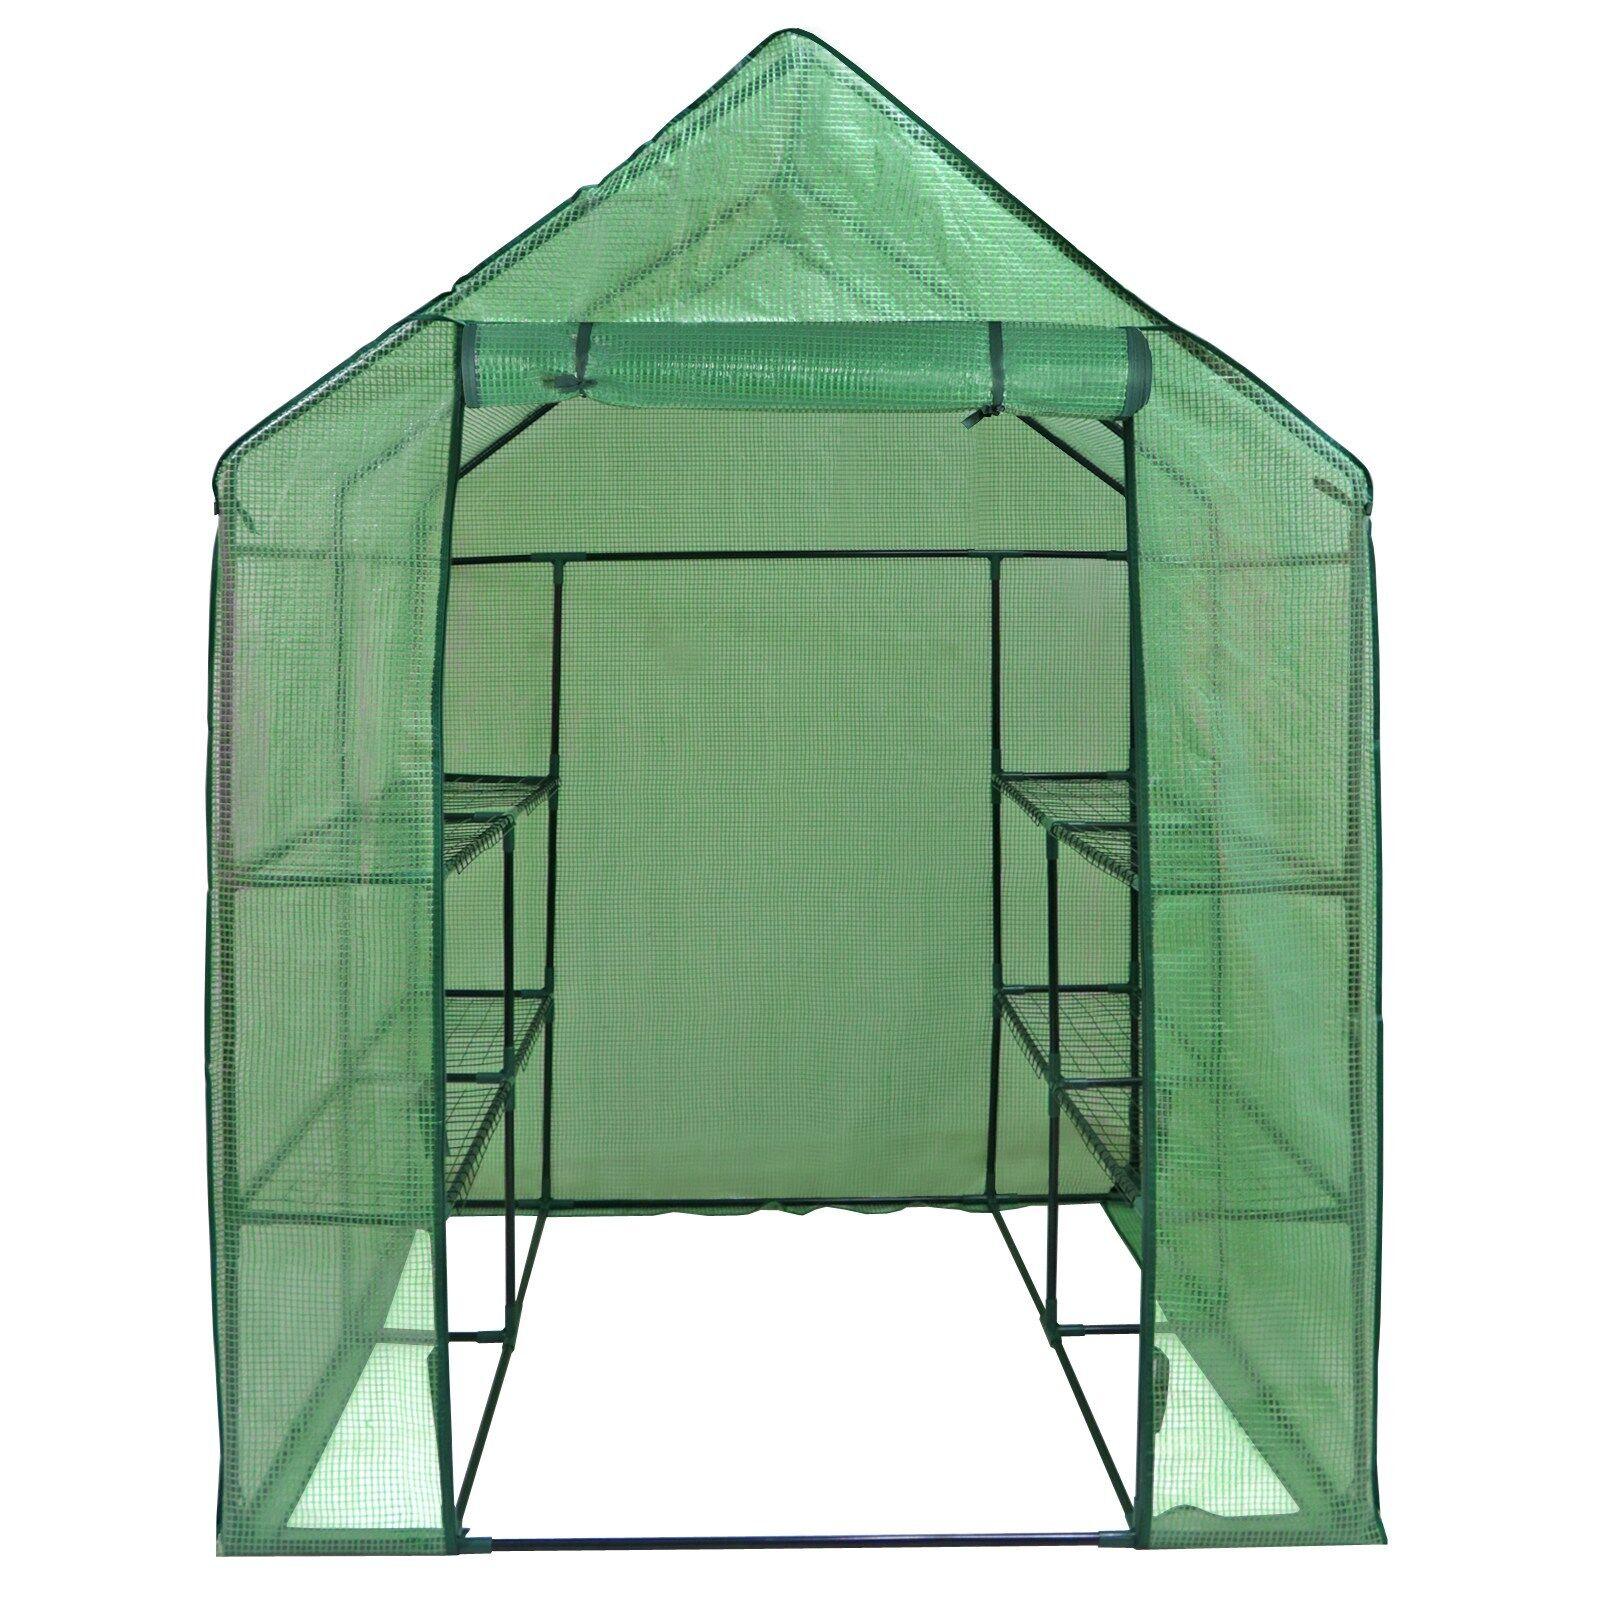 Mini 8 Shelves  3 Tiers Walk In Door Outdoor Green House for Planter Portable Garden Structures & Shade